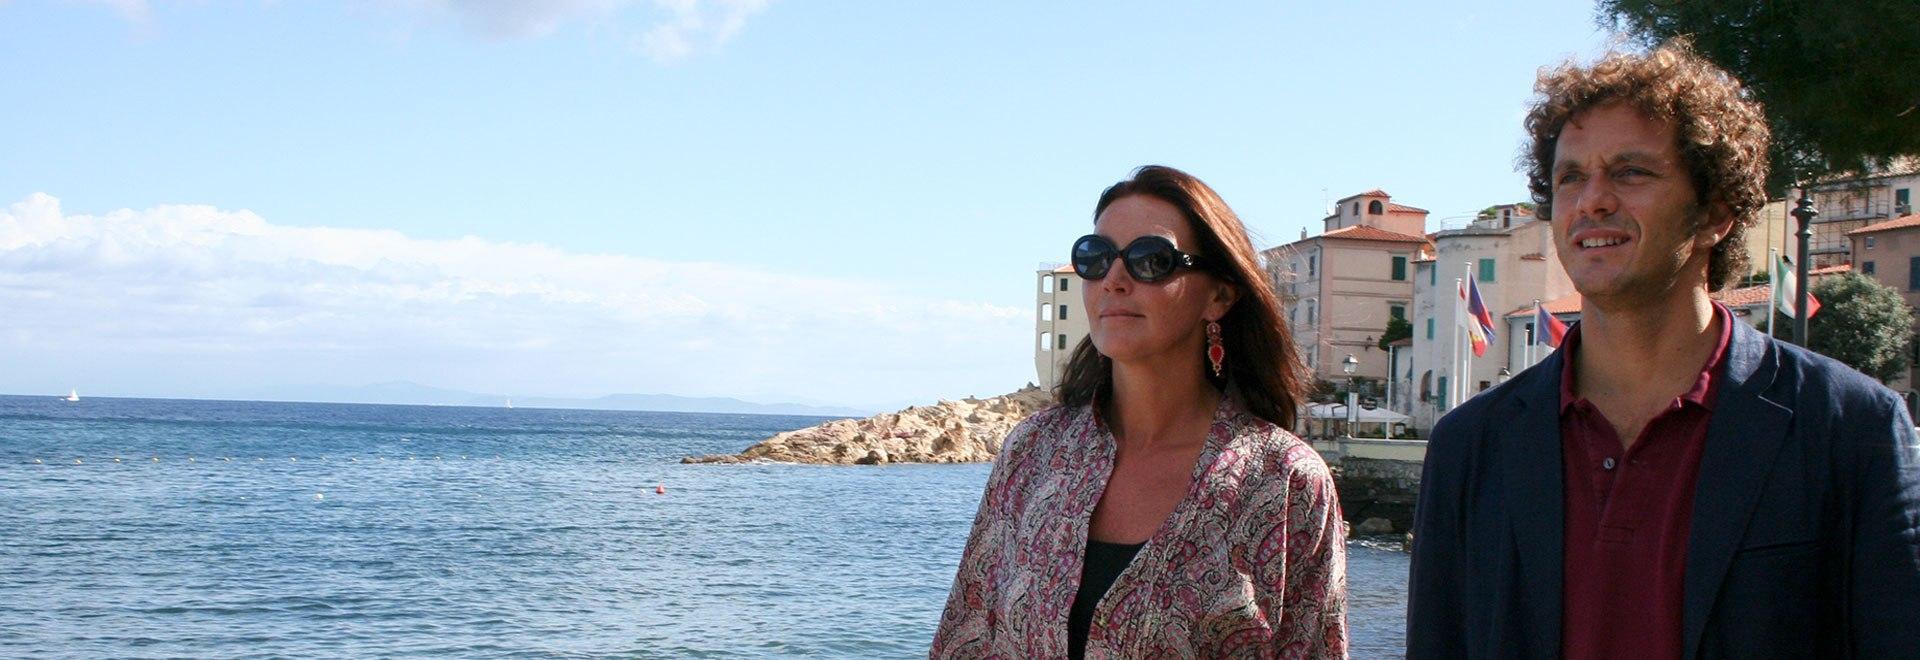 Isola d'Elba, la perla caduta in mare